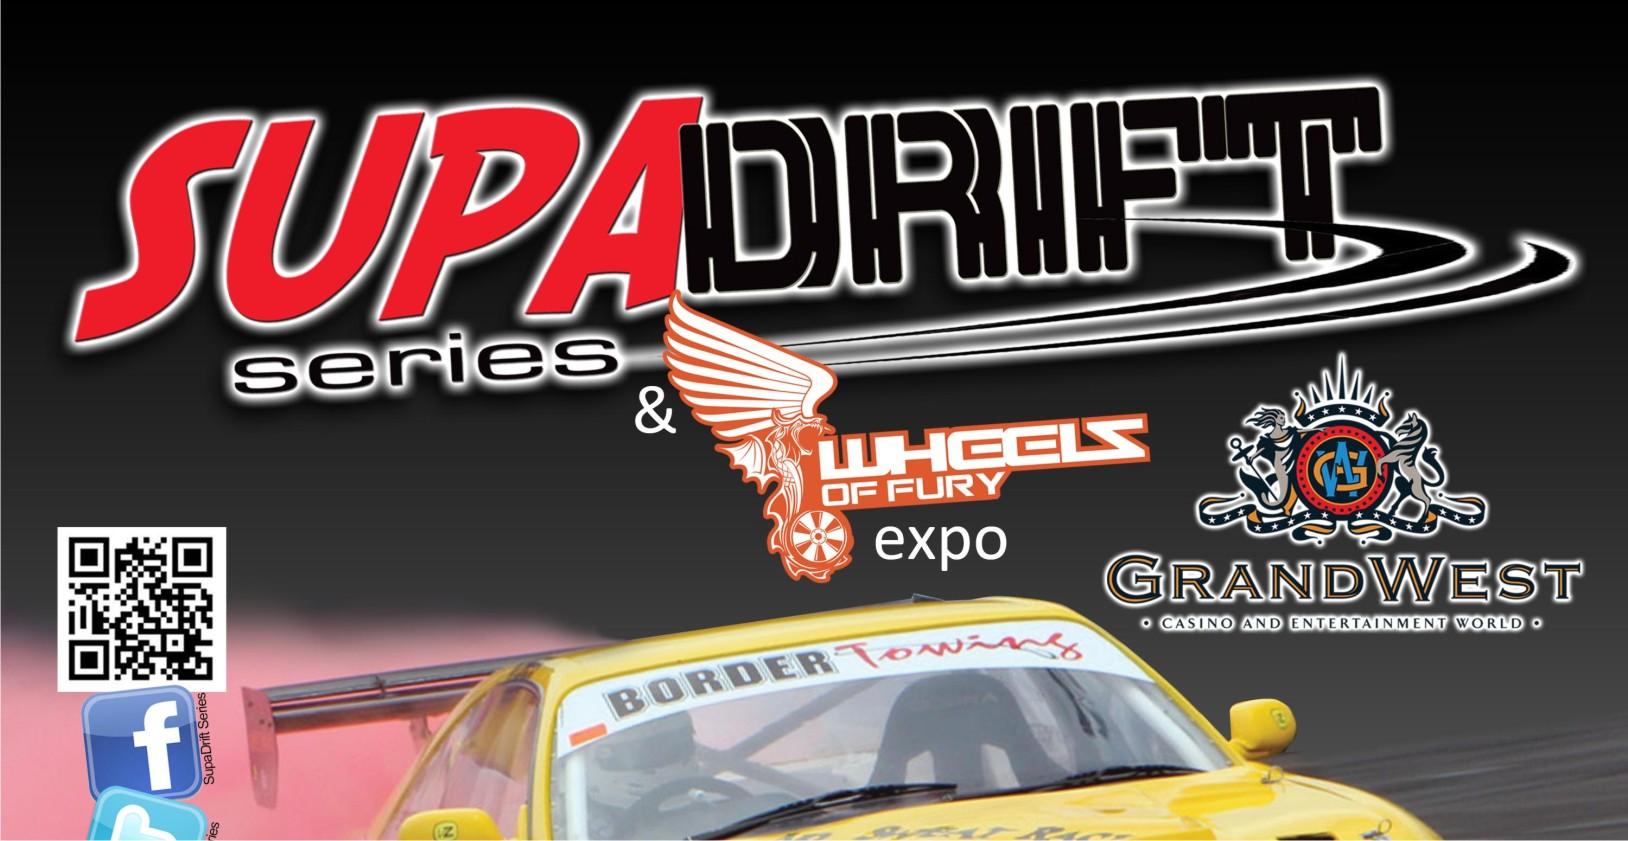 Supadrift Series 03 set to hit Cape Town